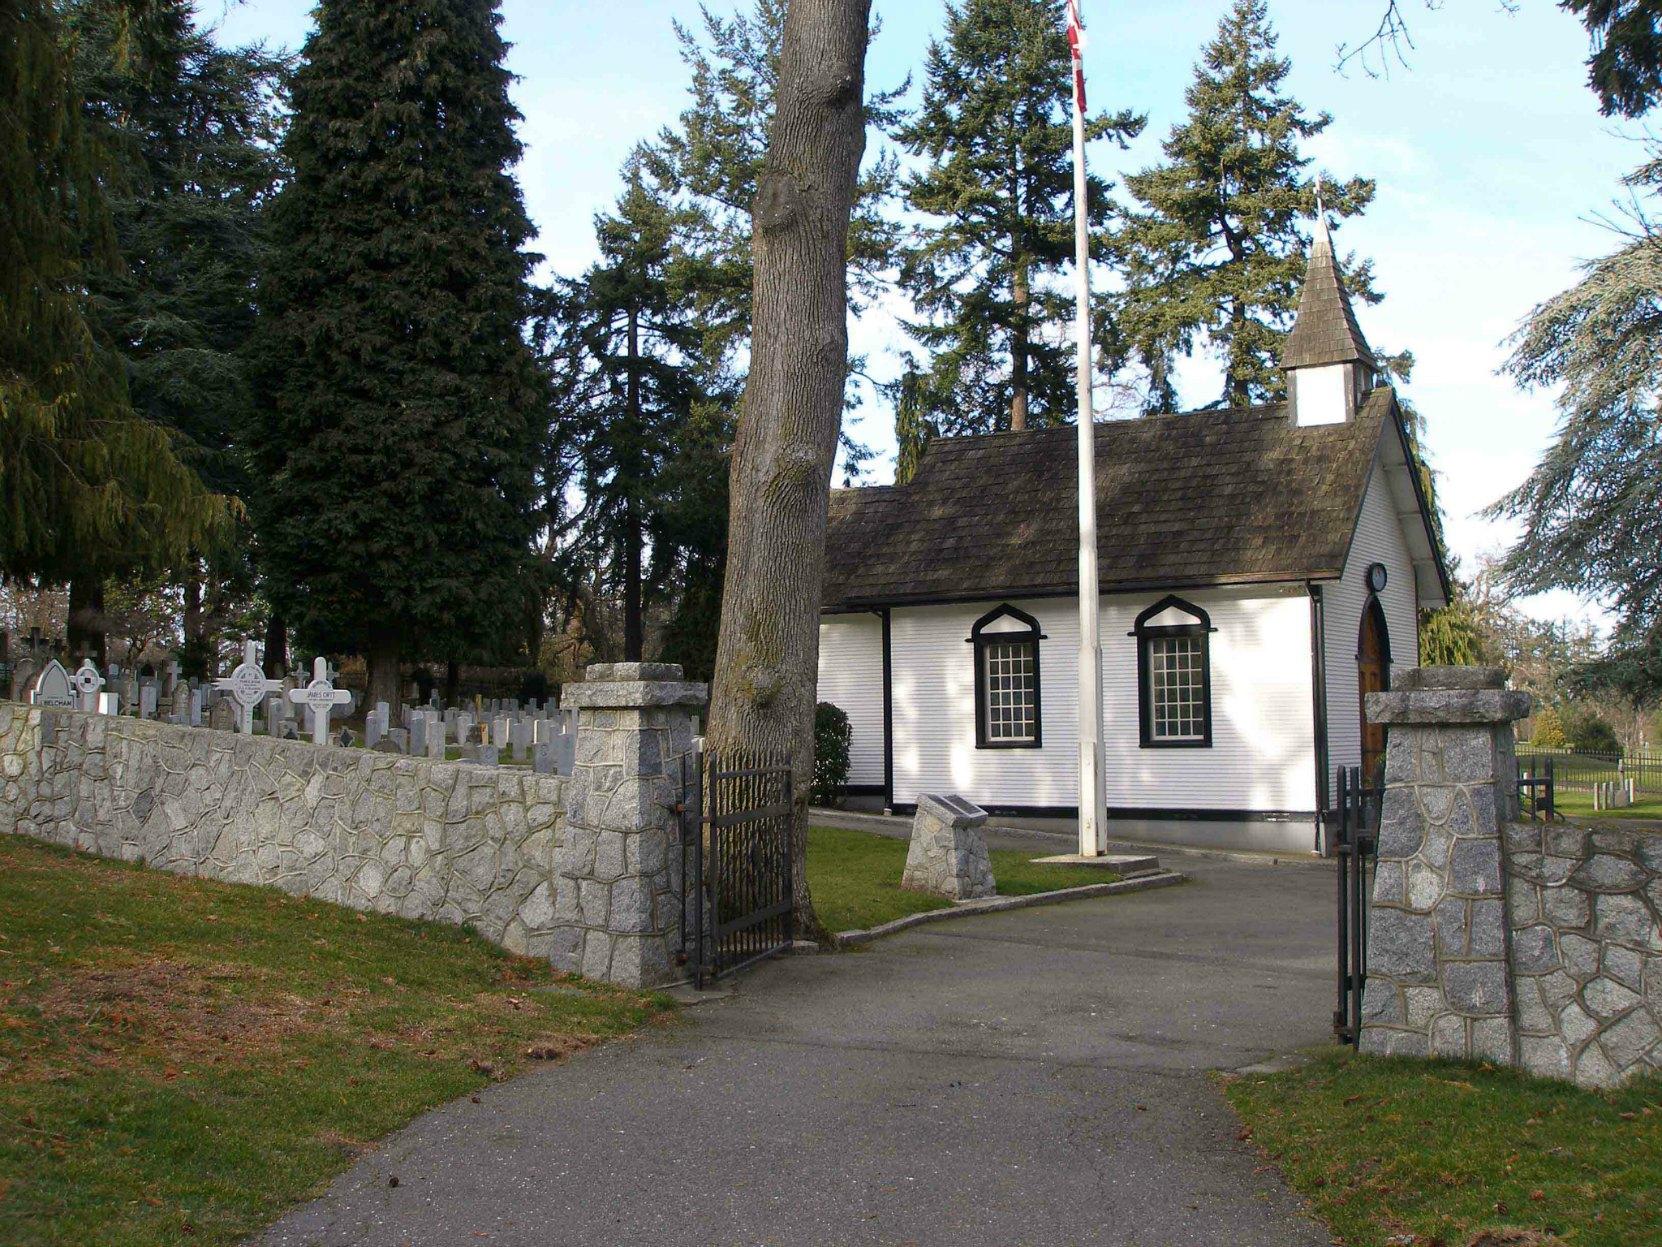 Naval & Veterans Cemetery entrance, Esquimalt, B.C.